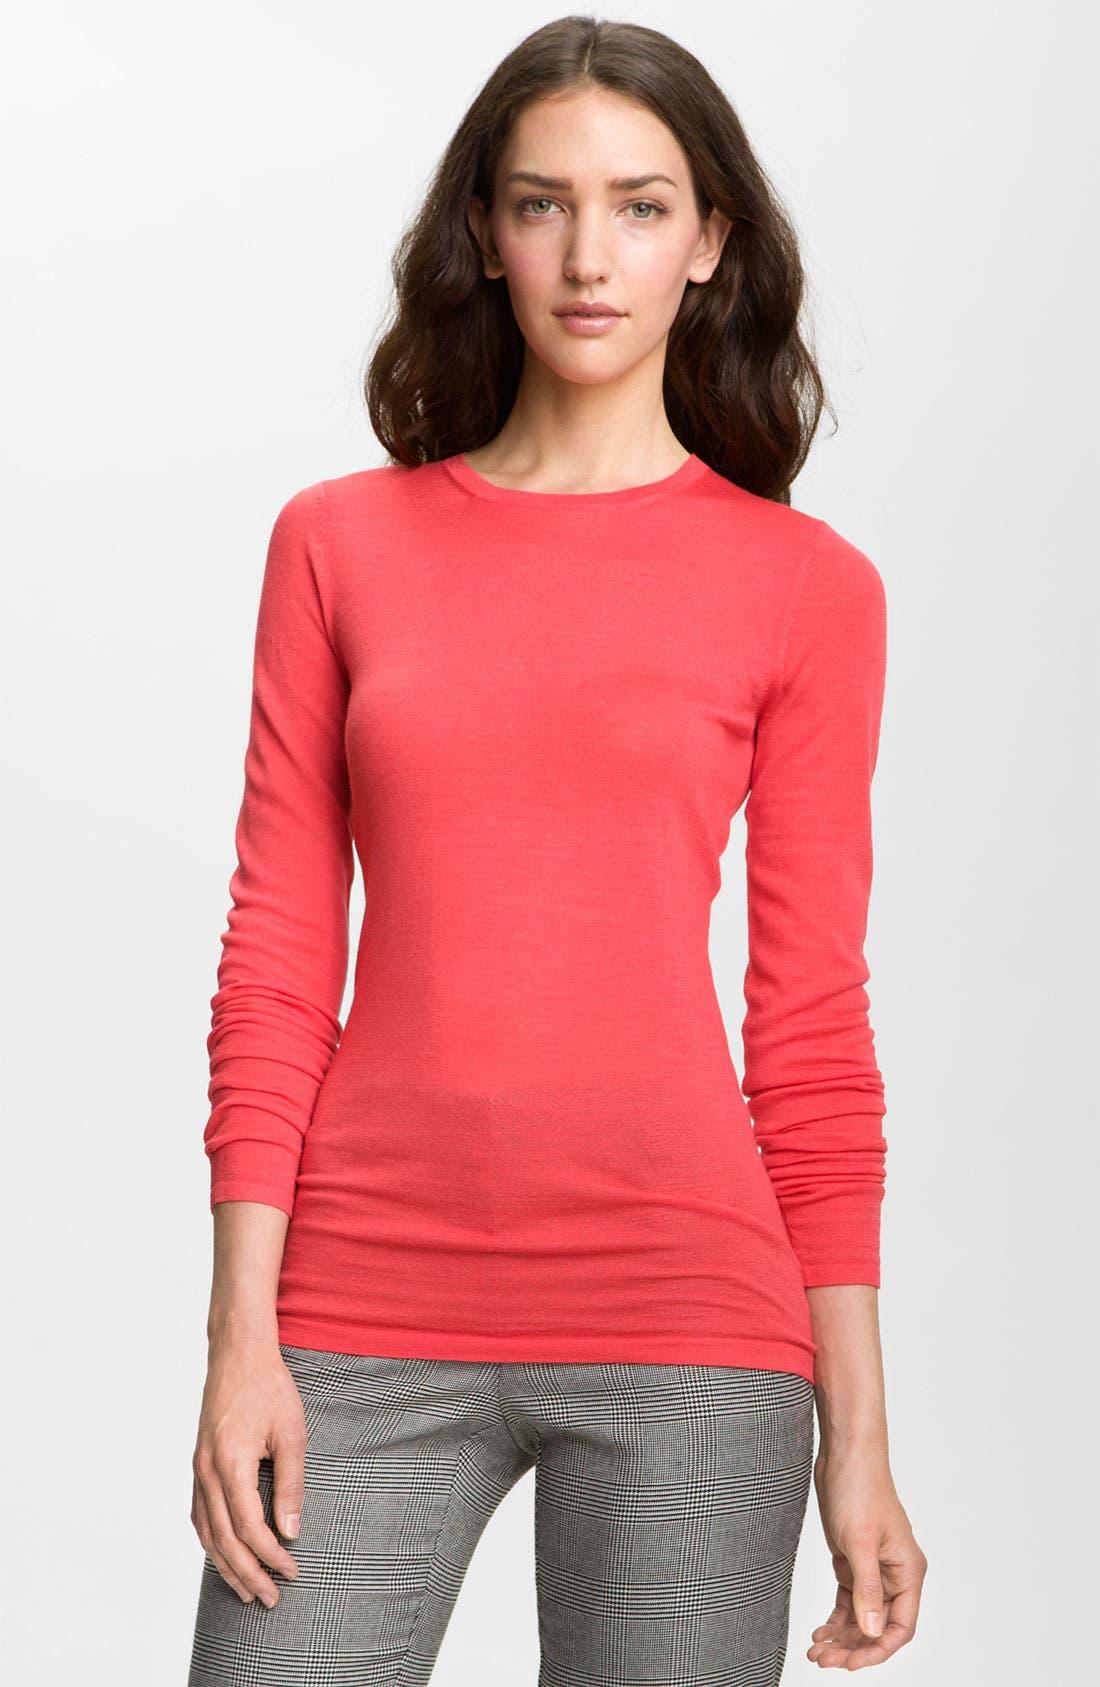 Main Image - Valette Refined Wool Crewneck Sweater